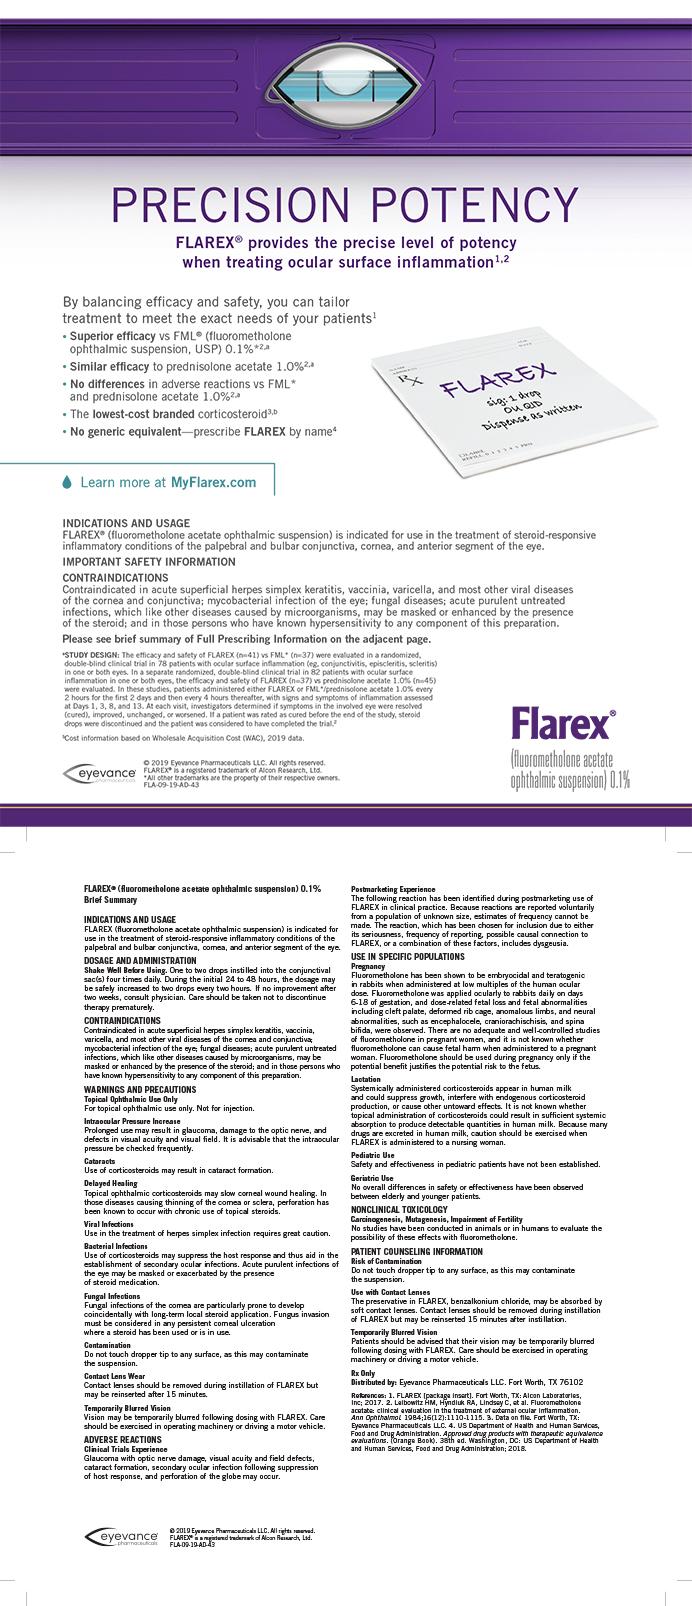 Eyevance Pharmaceuticals Flarex 1119